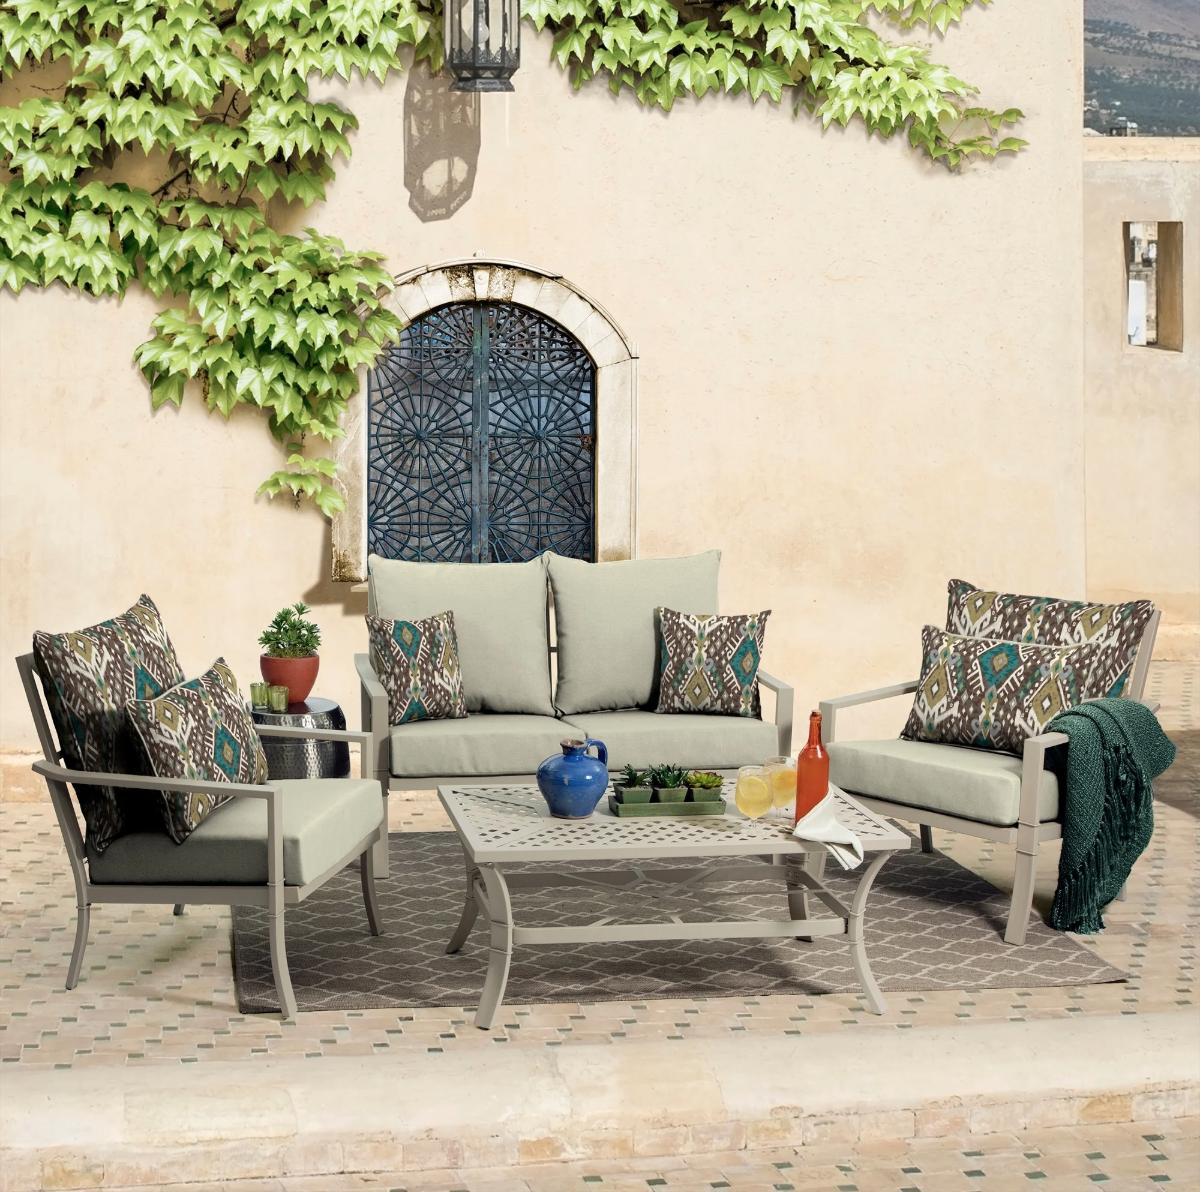 Outdoor Patio Cushions Beige UV Resistant